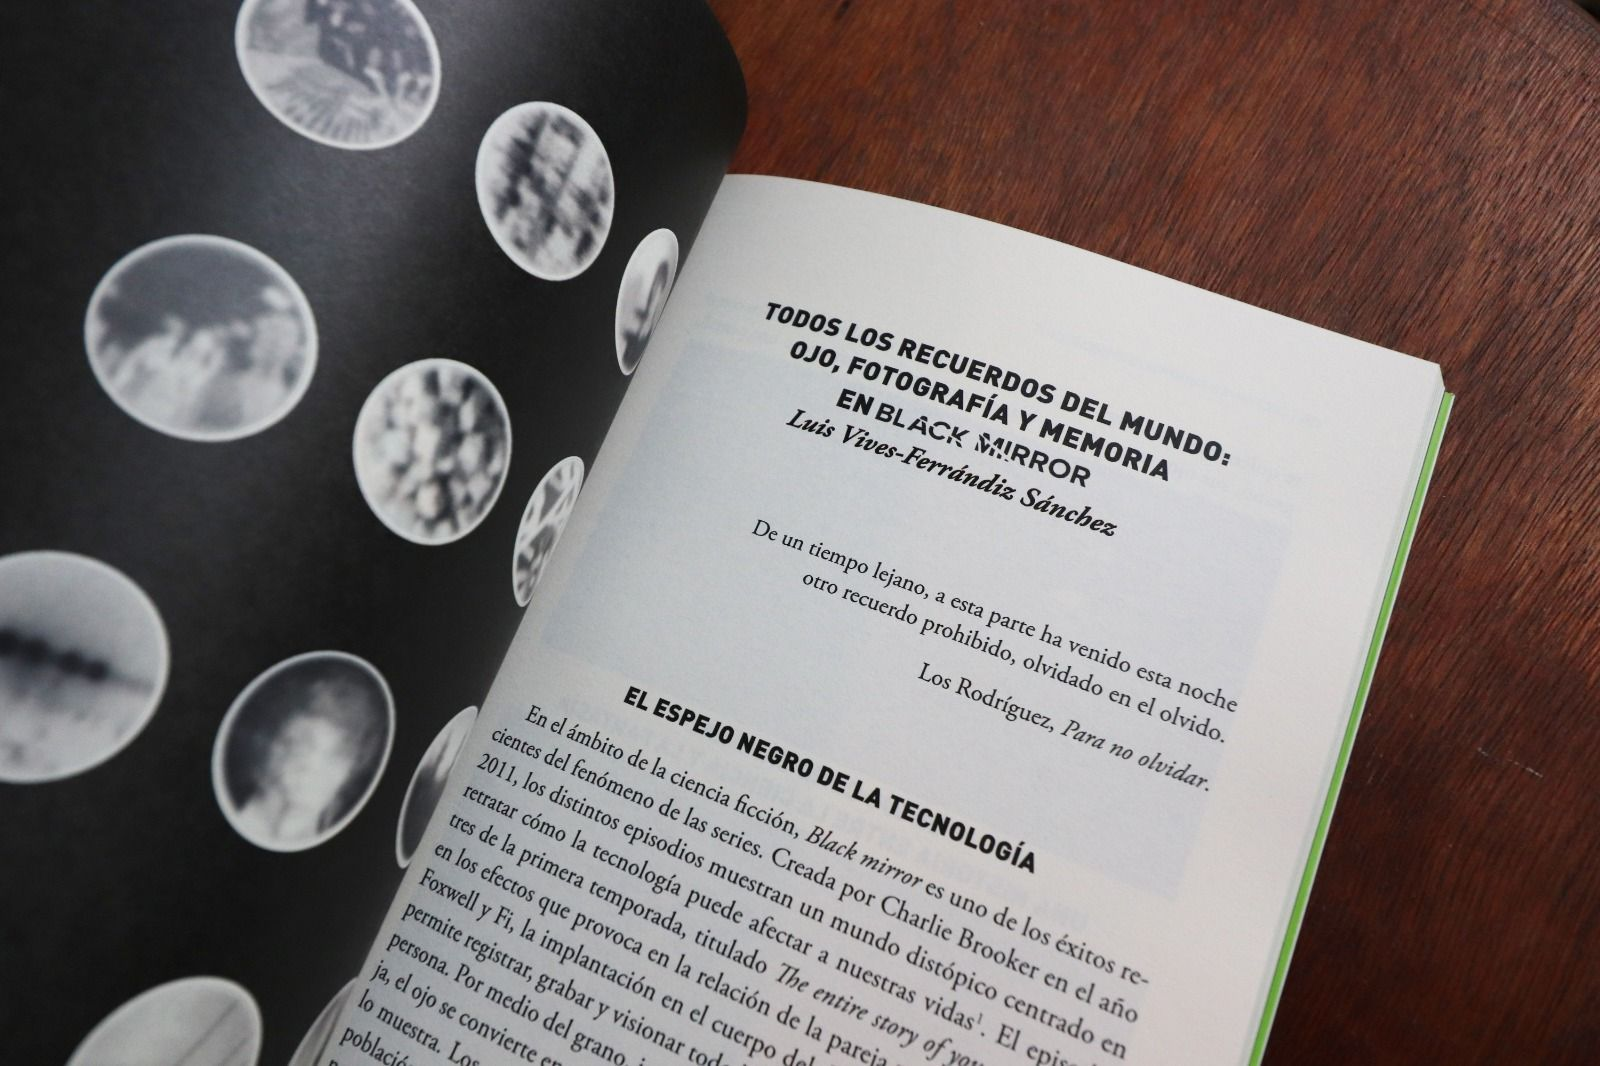 Imaginar Mundos – Sans Soleil Ediciones 2019-05-14 at 19.45.44 (9)